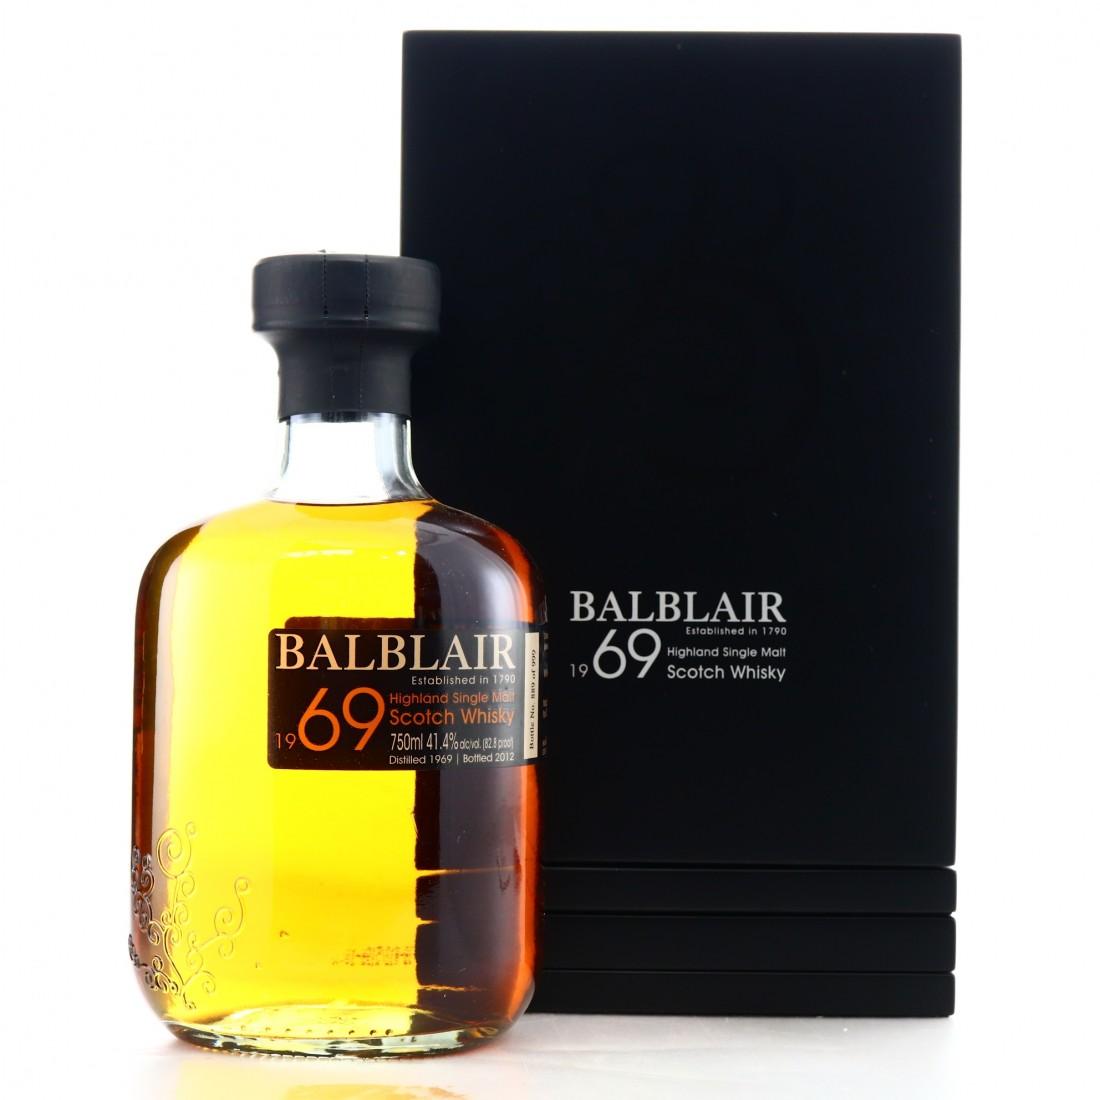 Balblair 1969 1stRelease 75cl / US Import